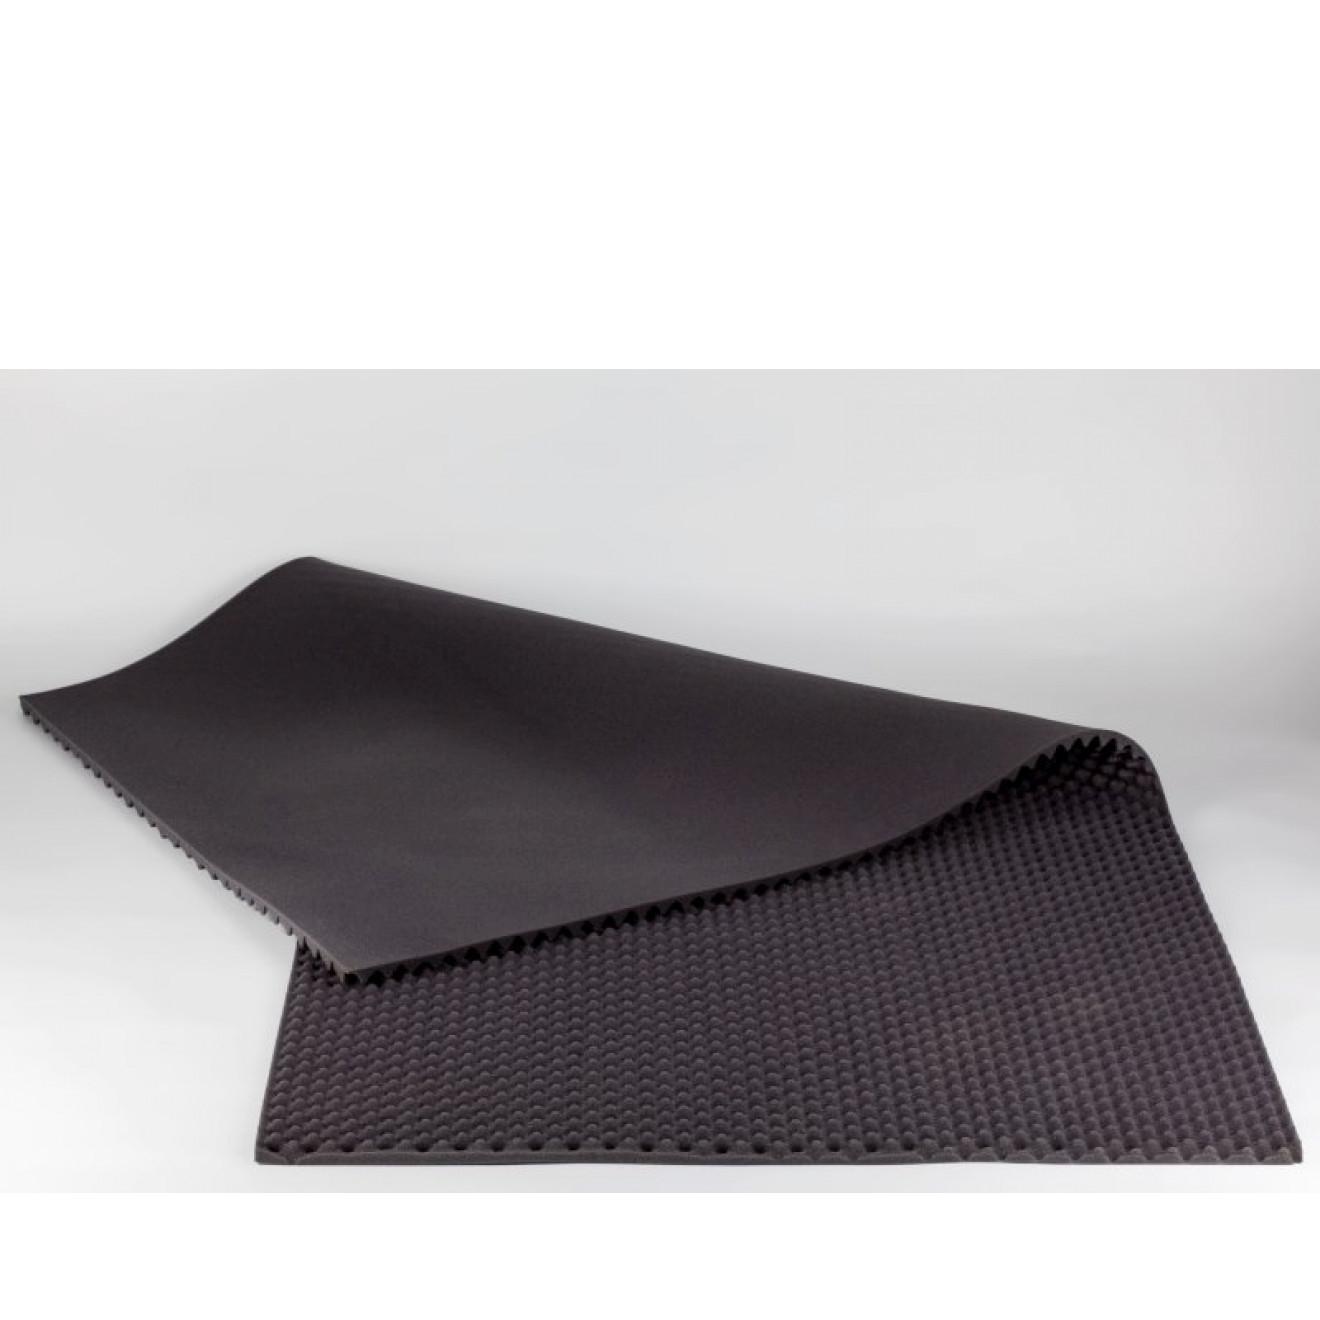 noppenschaumstoff online kaufen. Black Bedroom Furniture Sets. Home Design Ideas